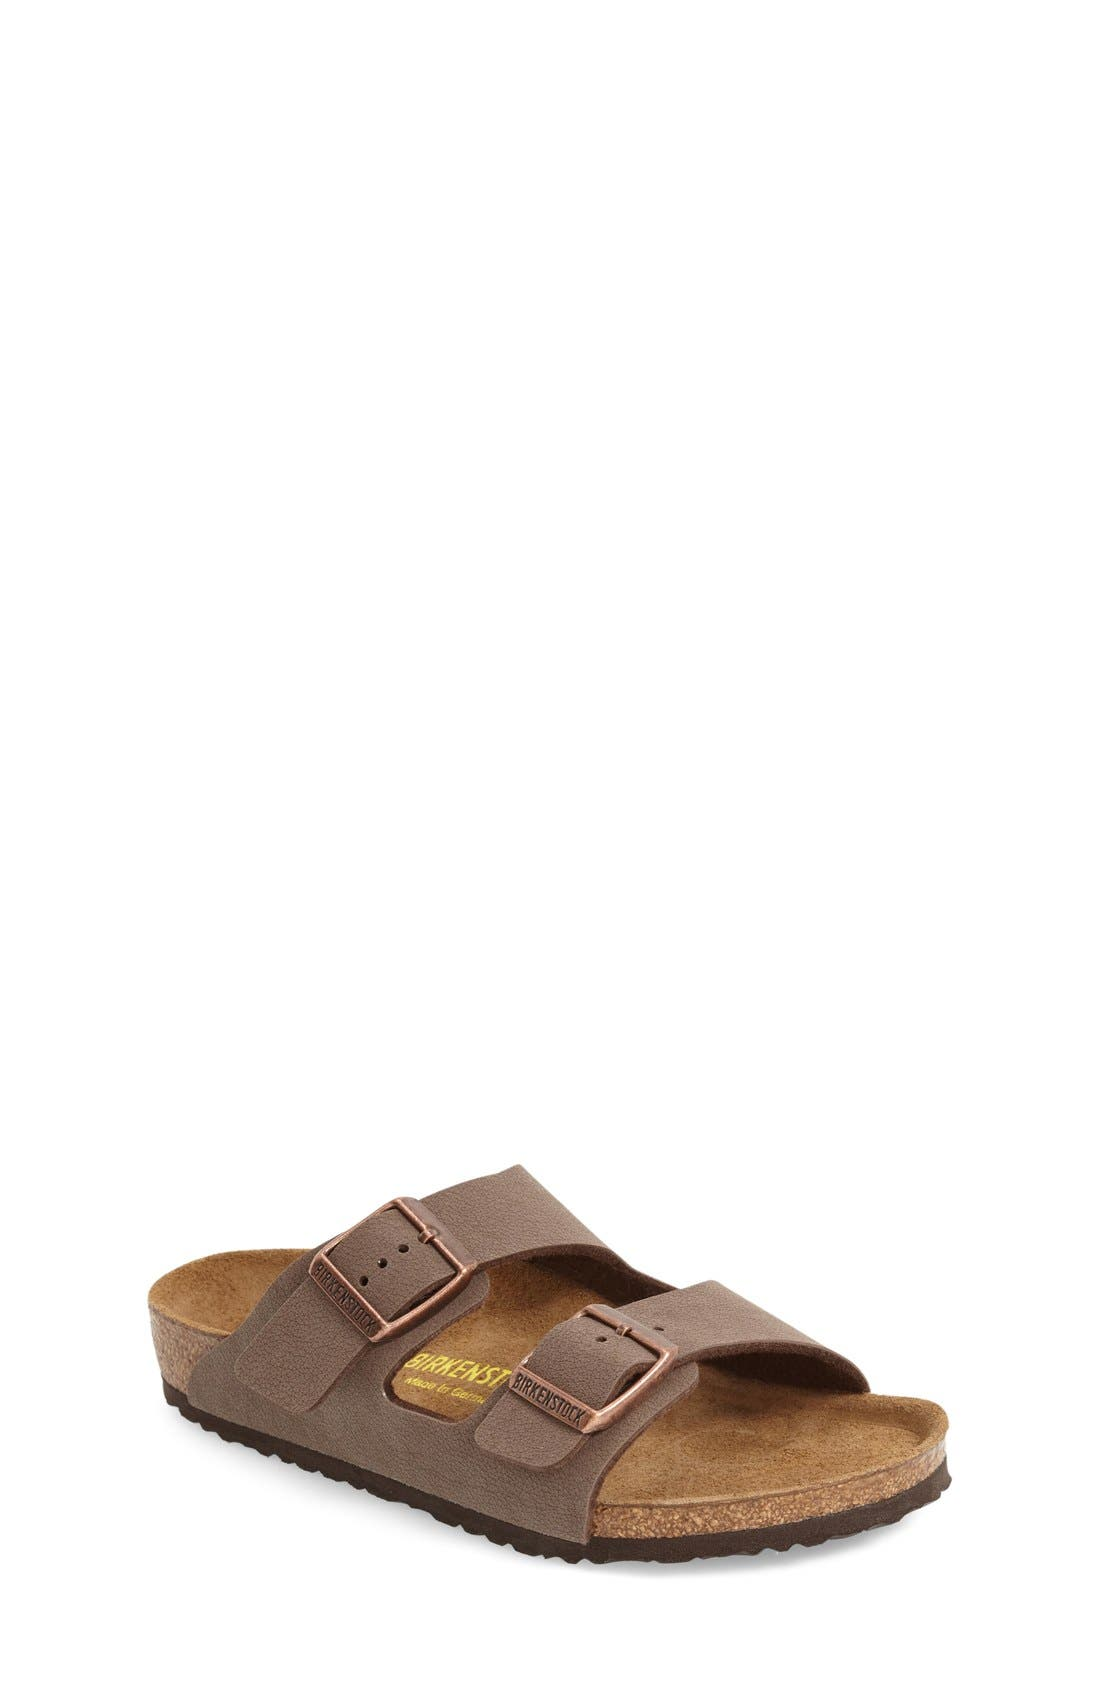 Birkenstock 'Arizona' Suede Sandal (Walker, Toddler & Little Kid)